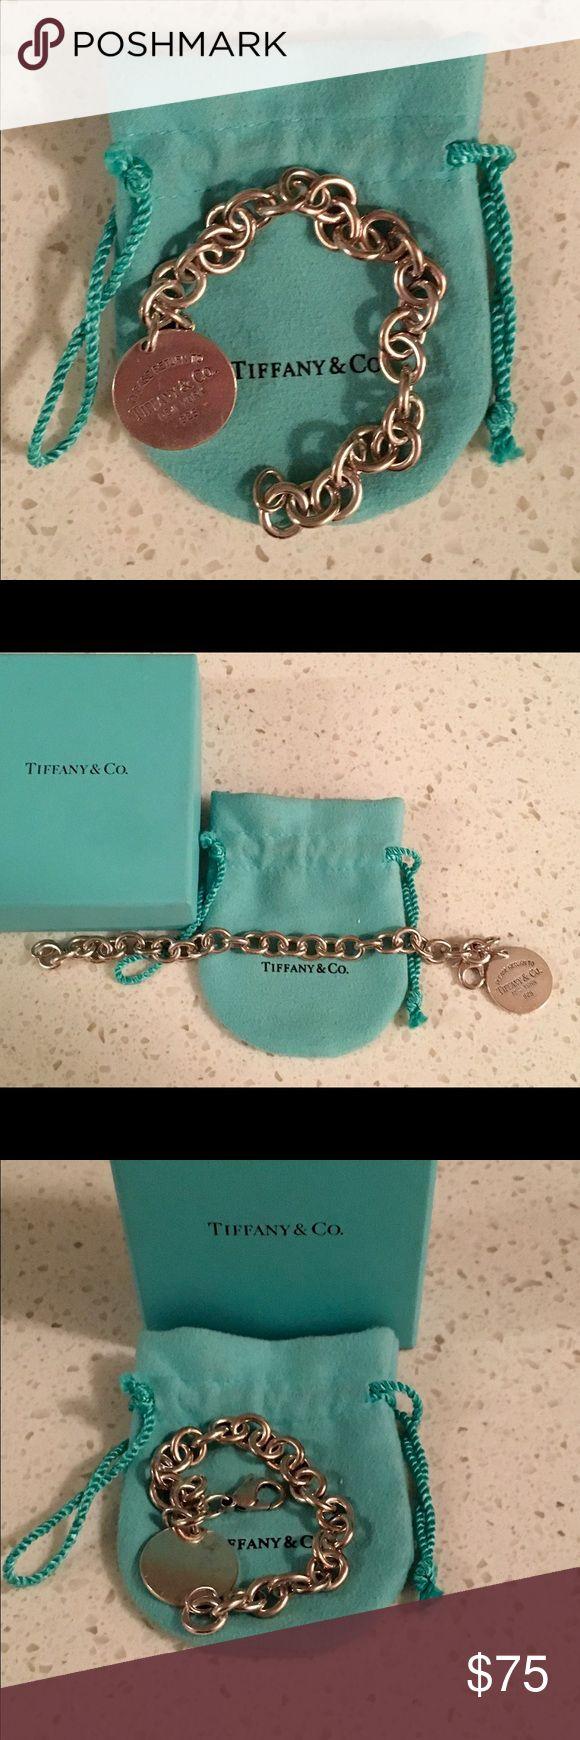 Tiffany & Co Return To Tiffany Charm Bracelet